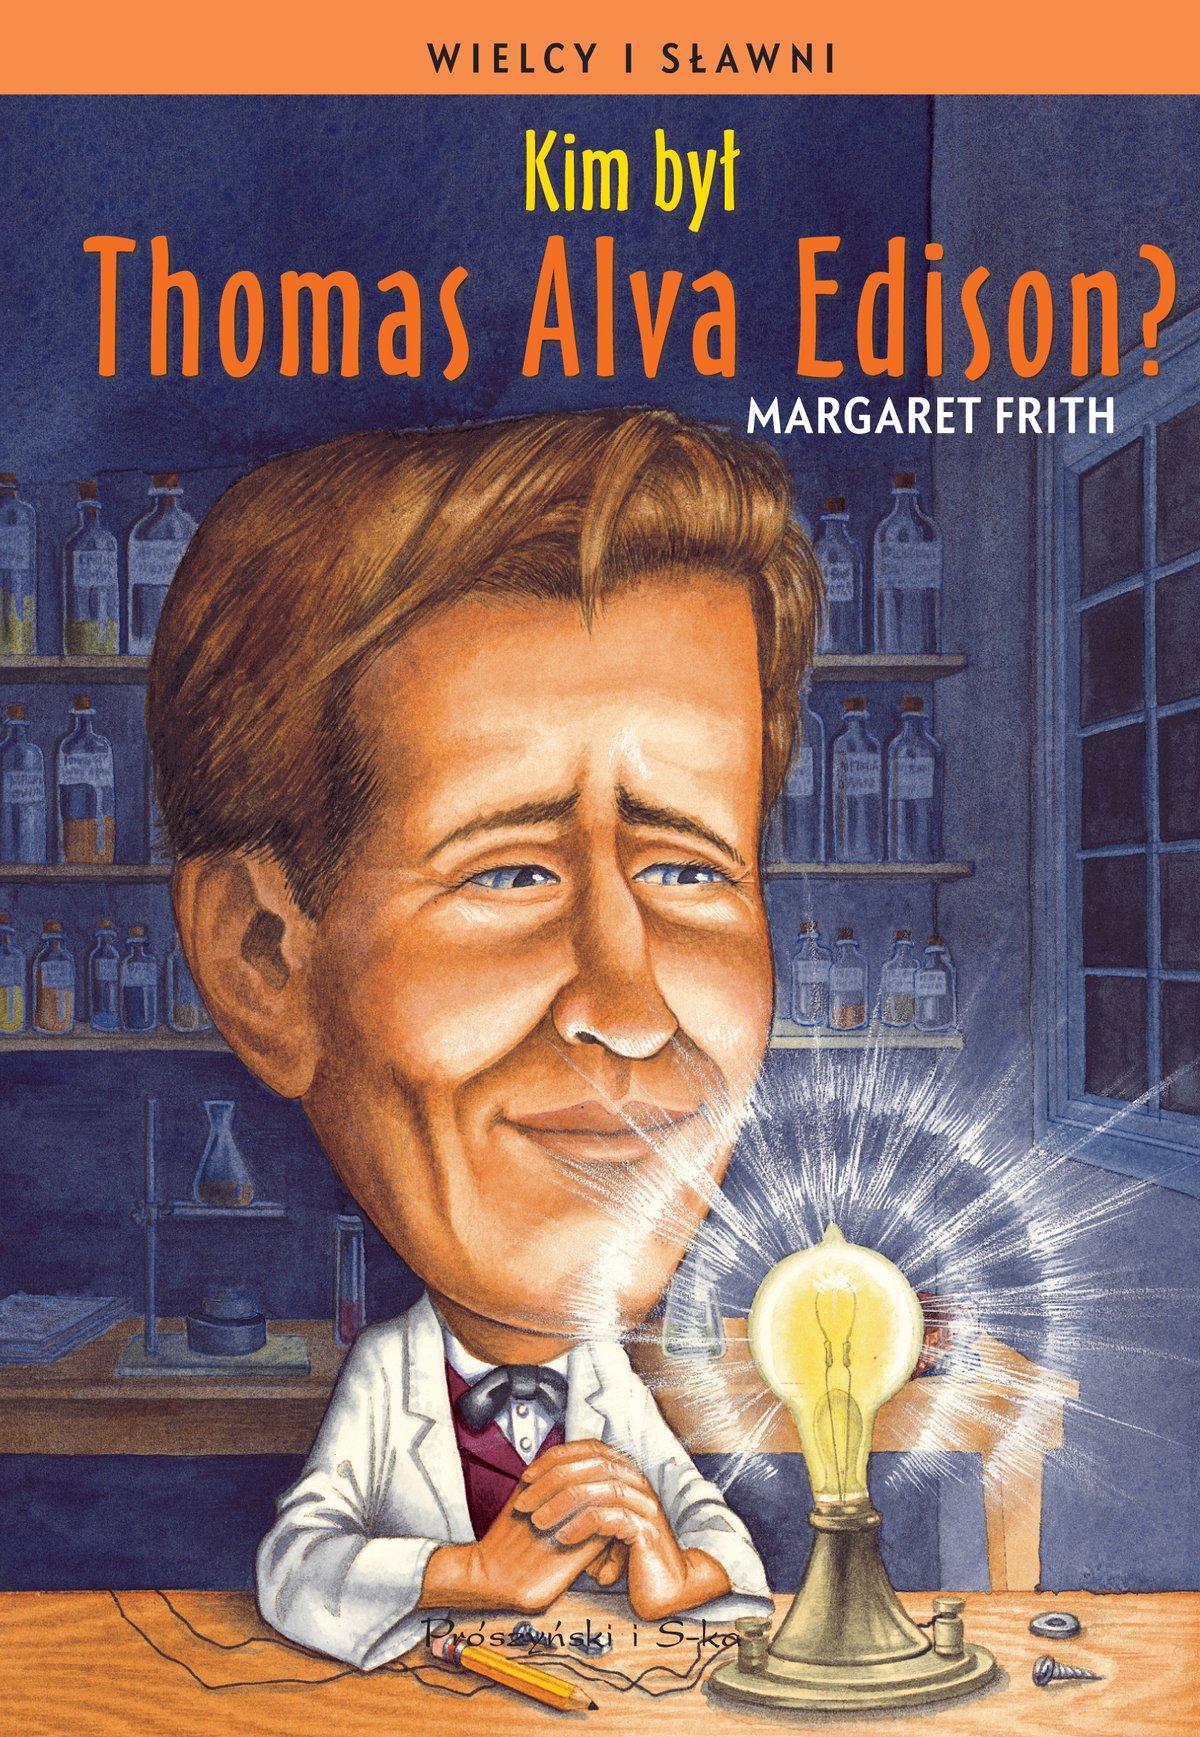 Kim był Thomas Alva Edison? - Ebook (Książka EPUB) do pobrania w formacie EPUB